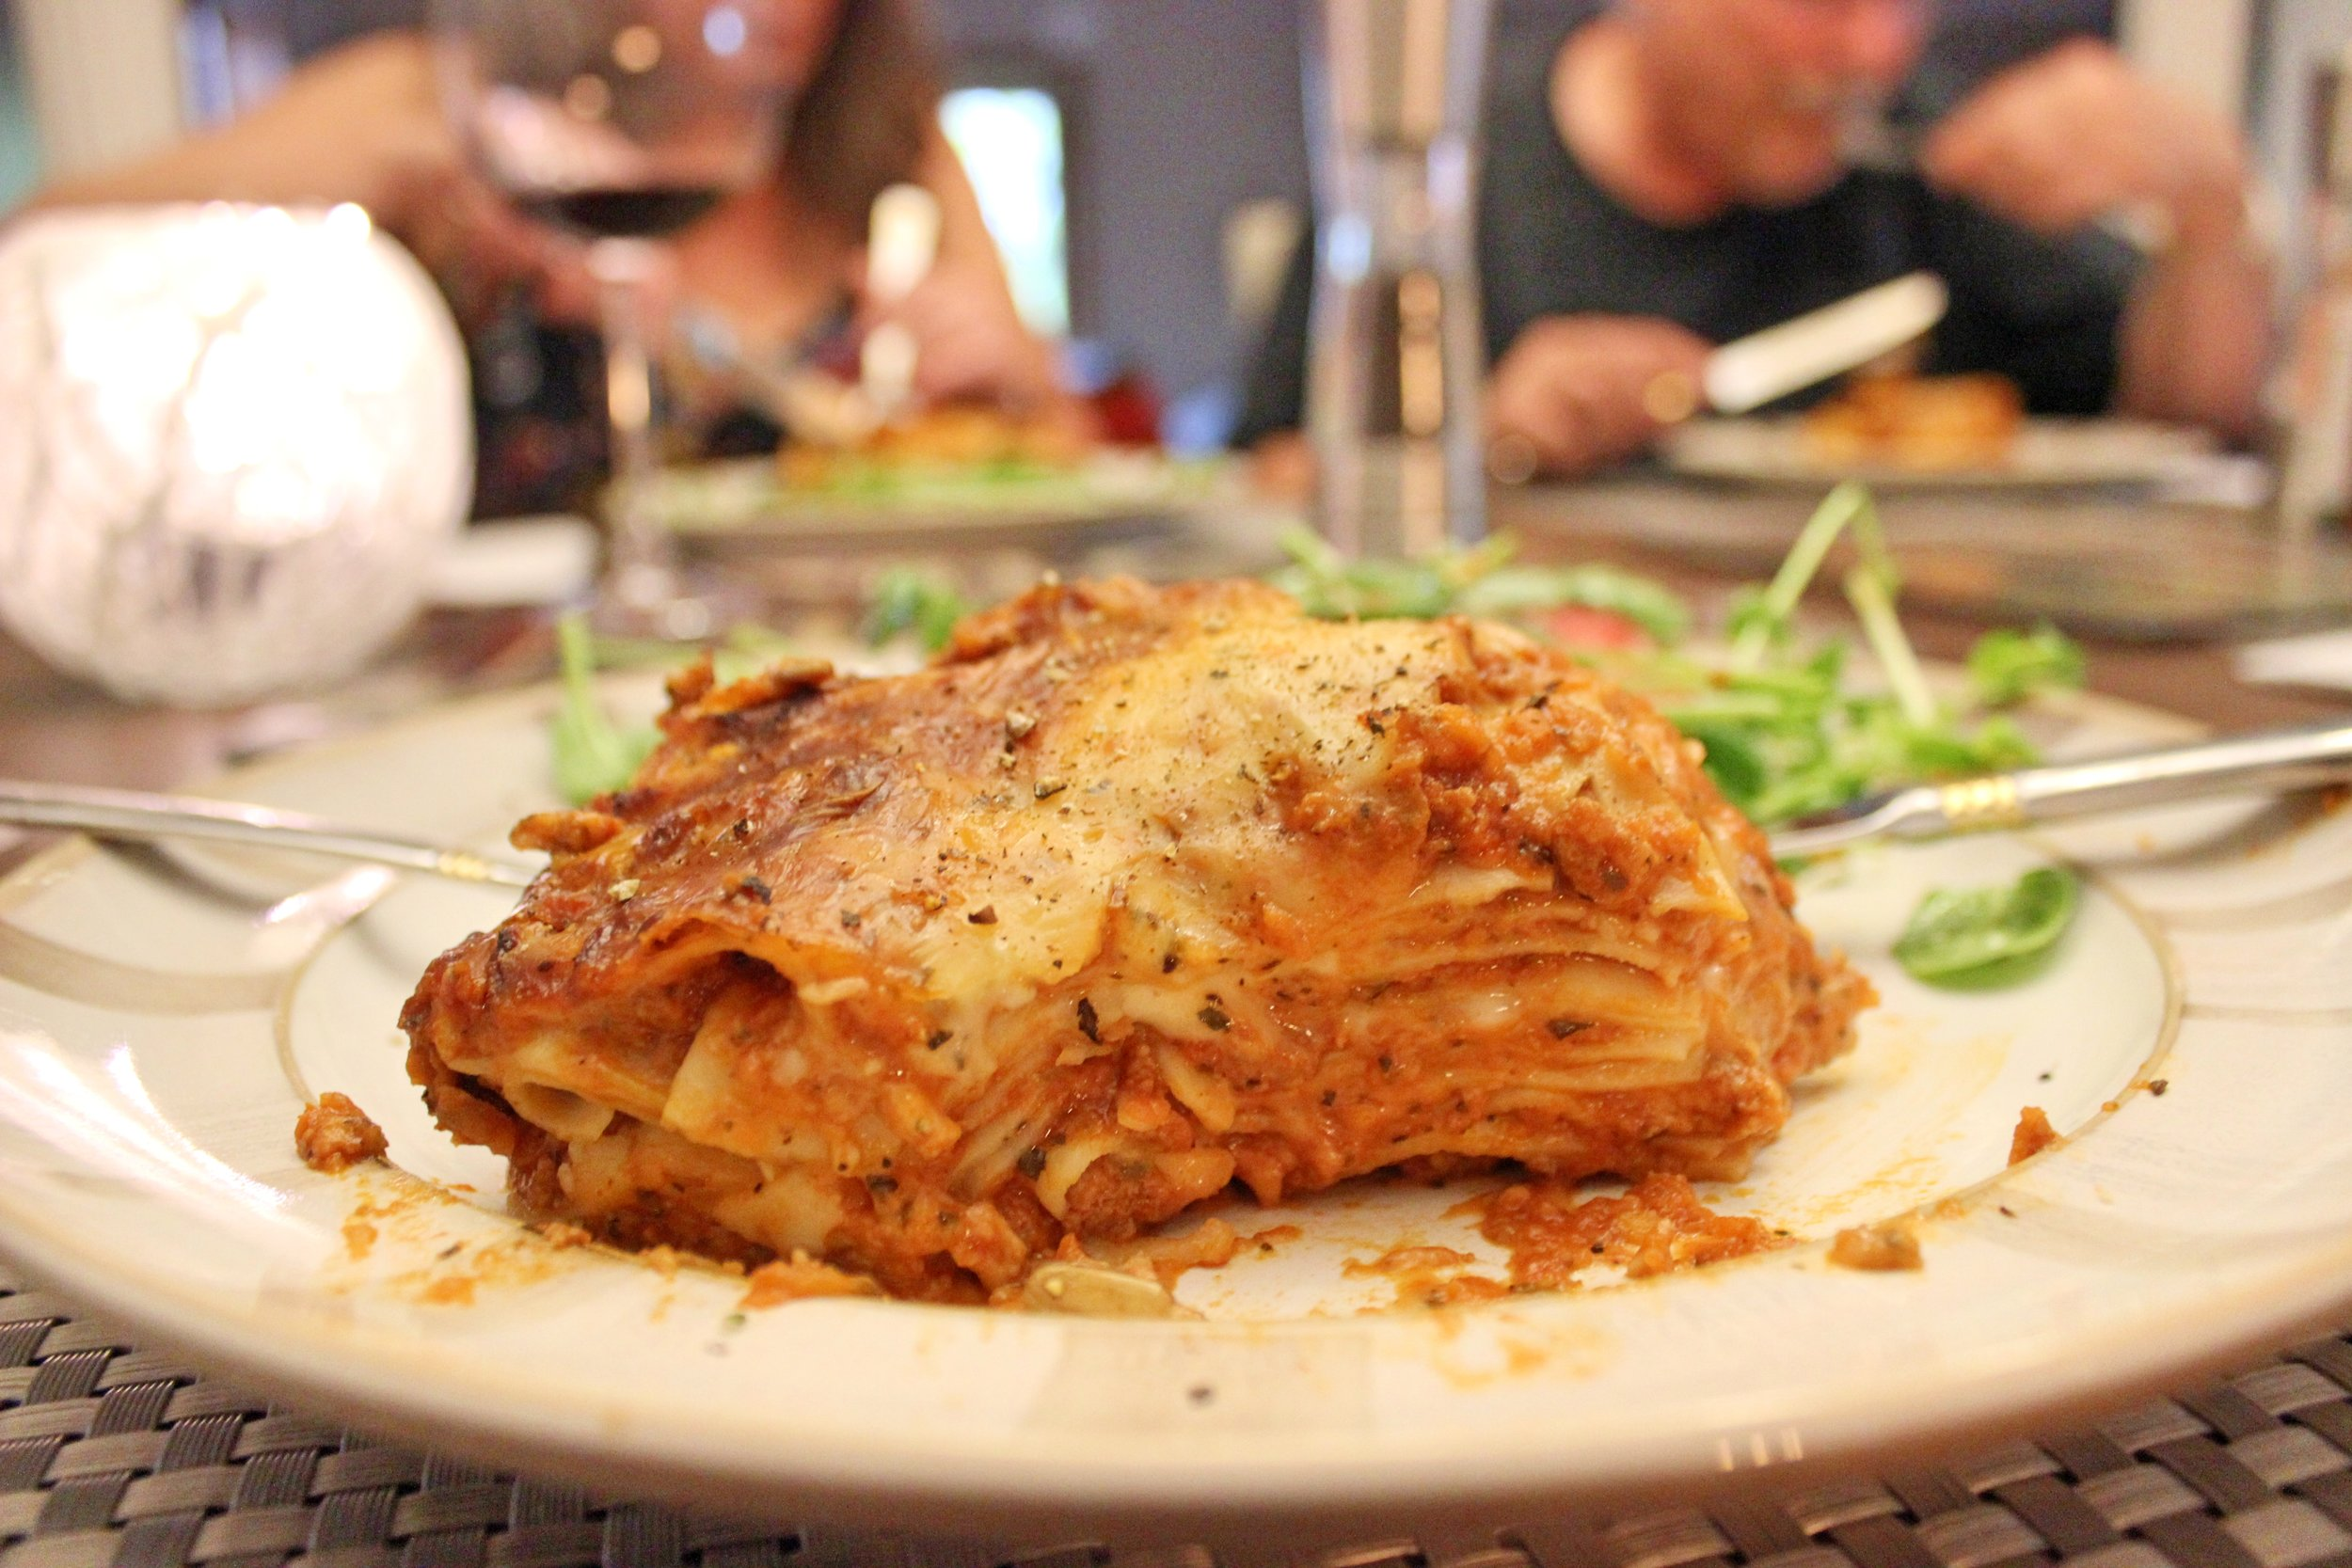 CIBO lasagna cu.jpg